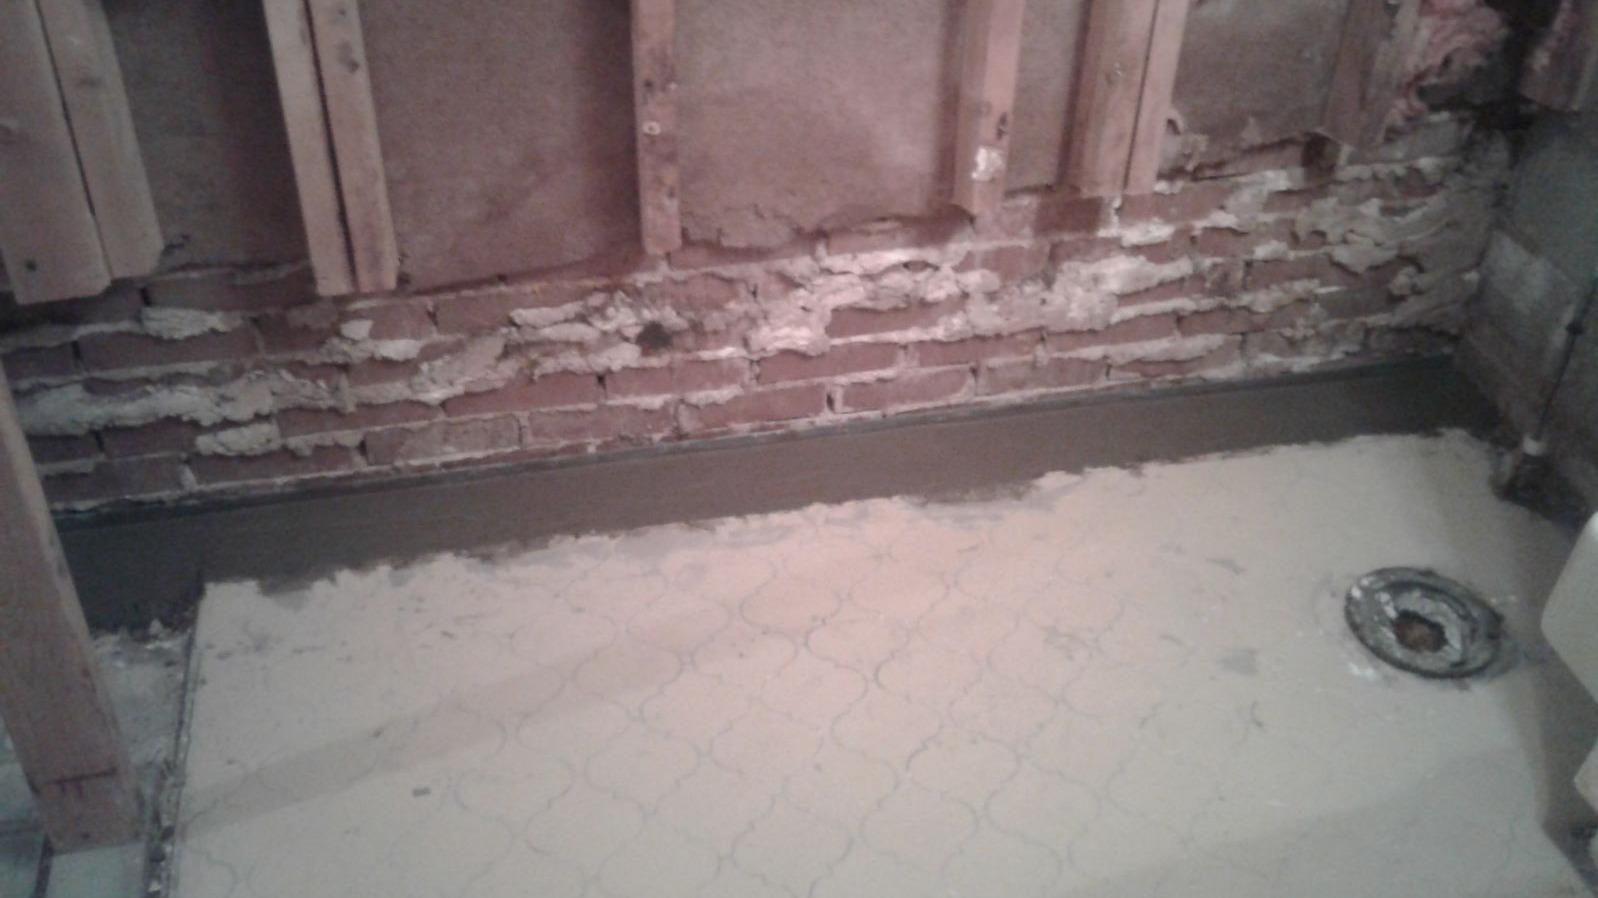 Basement Waterproofing Solutions in Aiken SC - After Photo